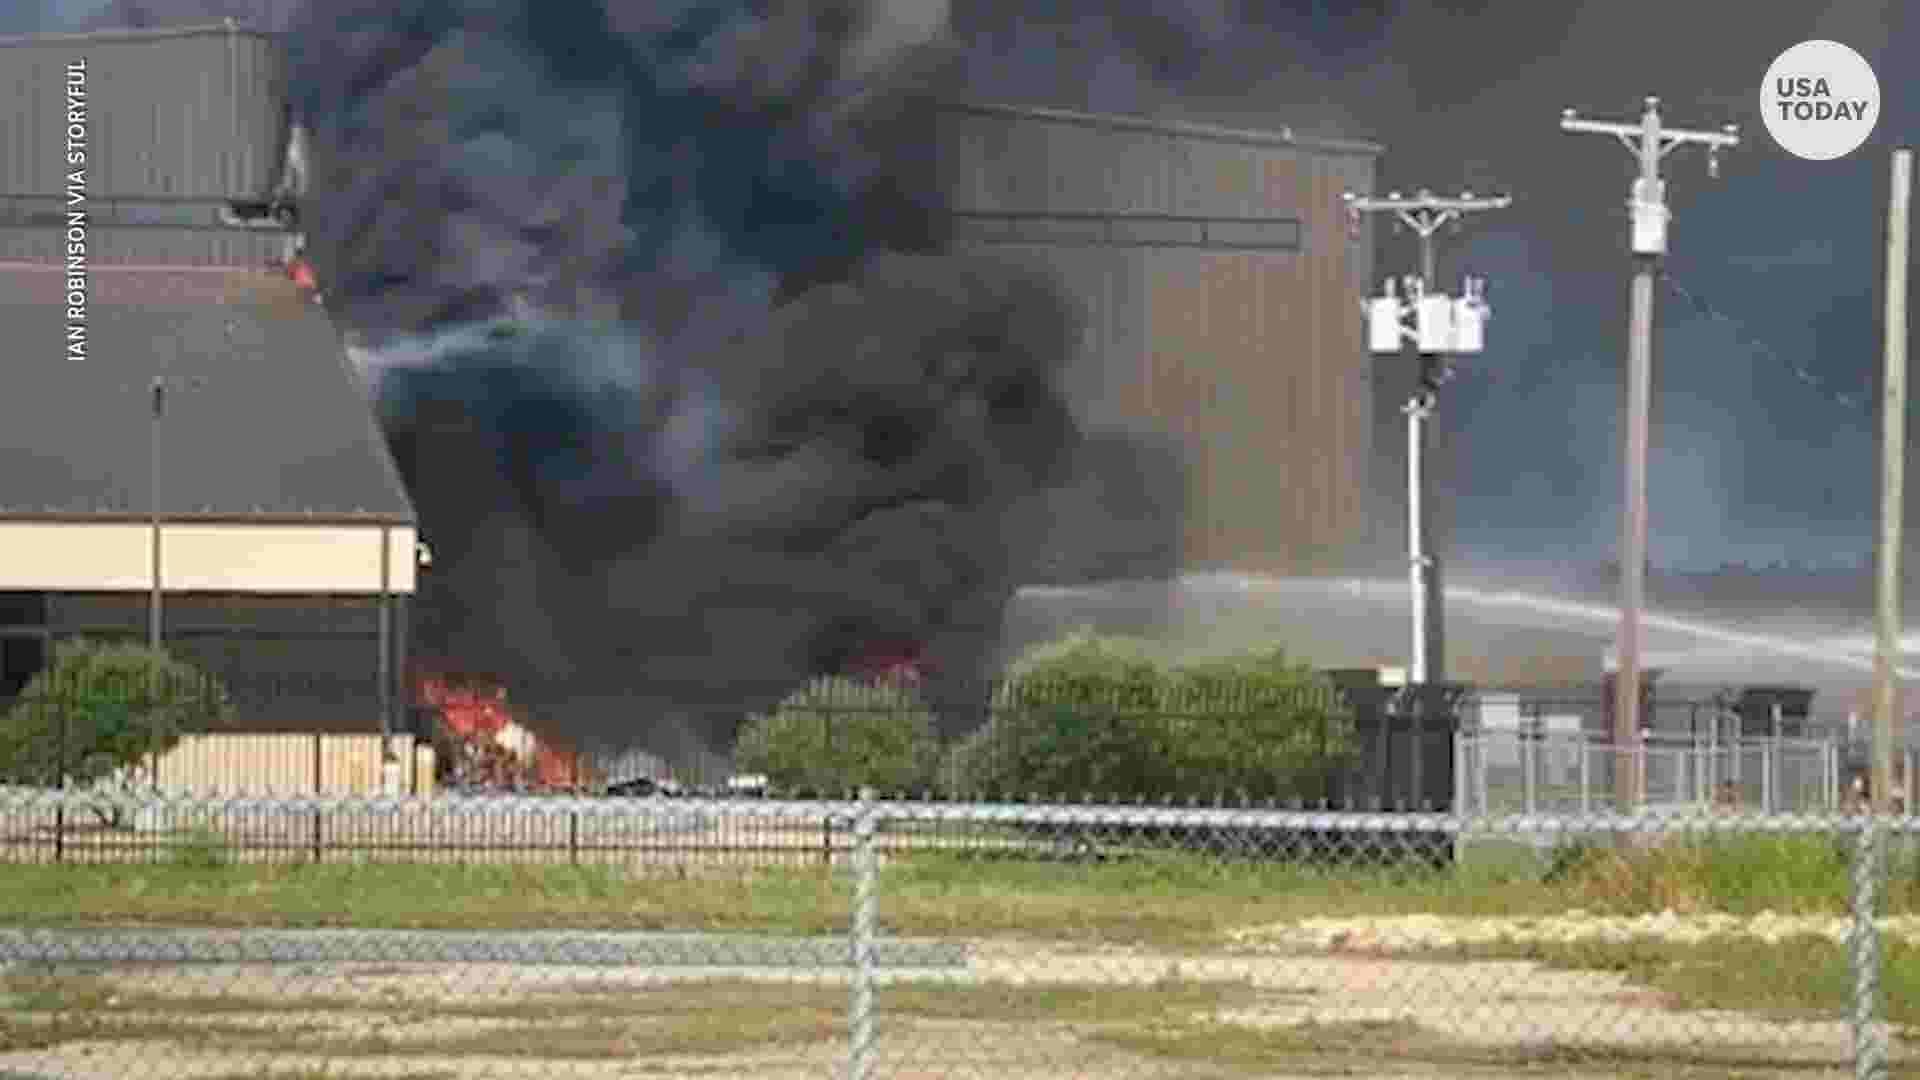 Plane crashes into hangar killing 10